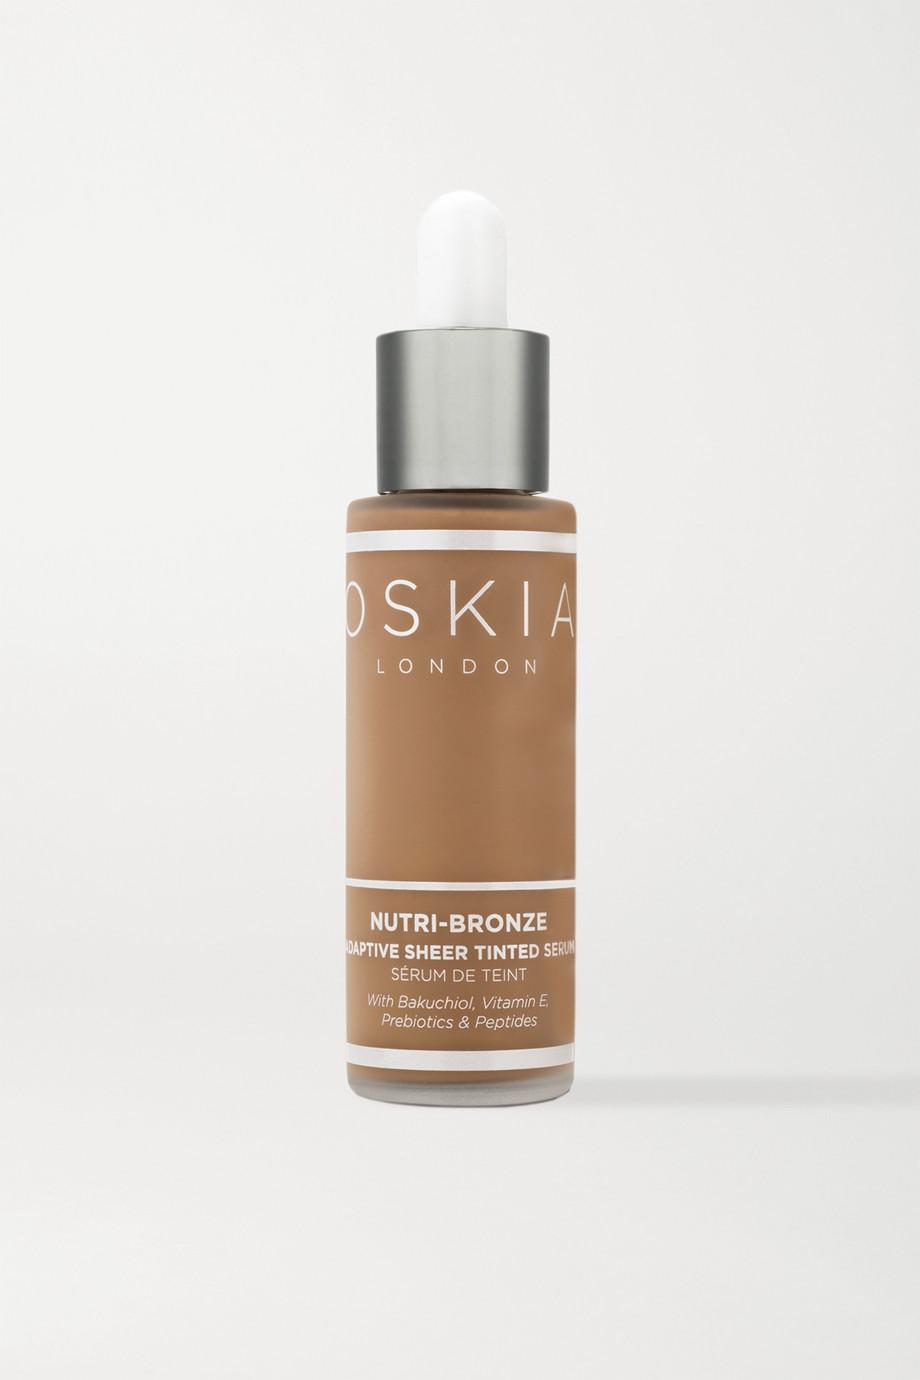 Oskia Nutri-Bronze Adaptive Sheer Tinted Serum, 30 ml – Getöntes Serum